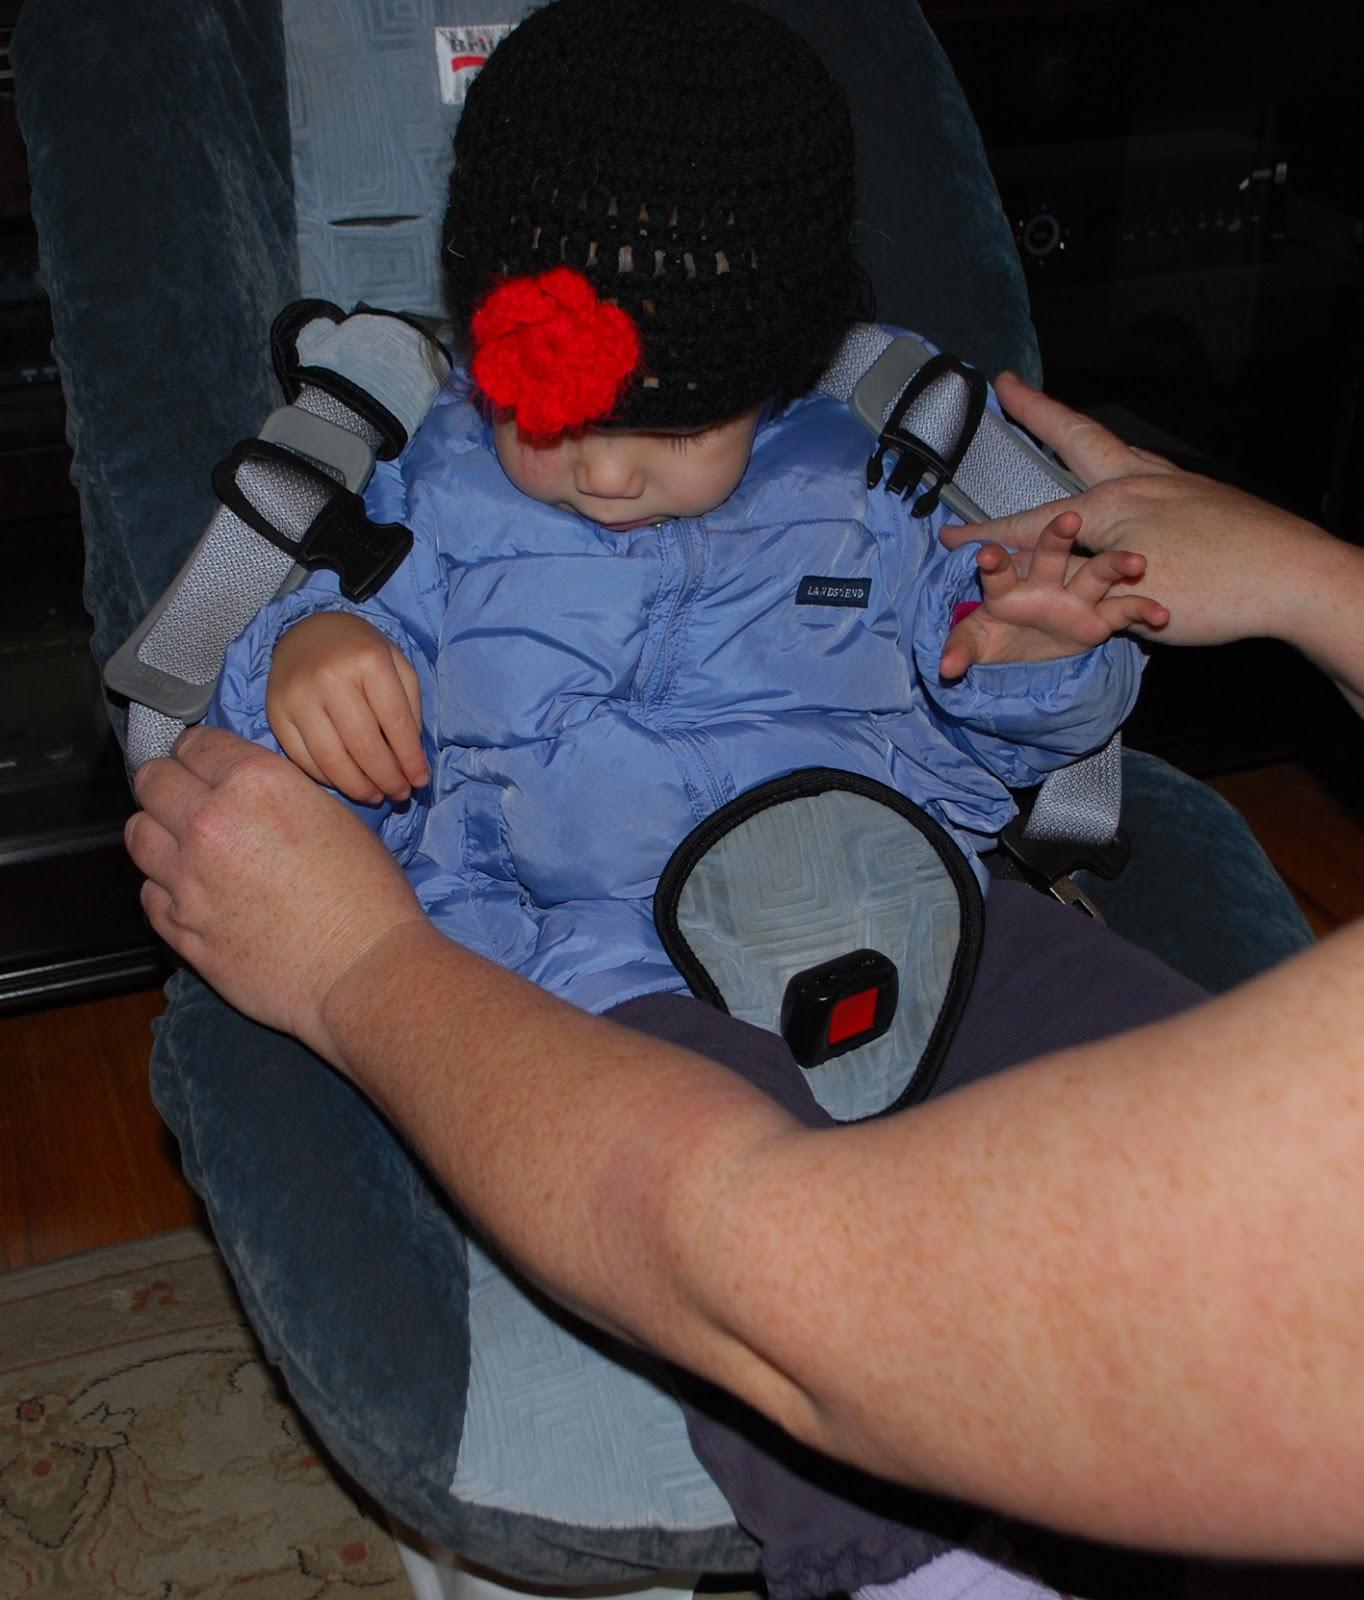 Britax Light Bar Wiring Diagram : Car seat harness pinch test get free image about